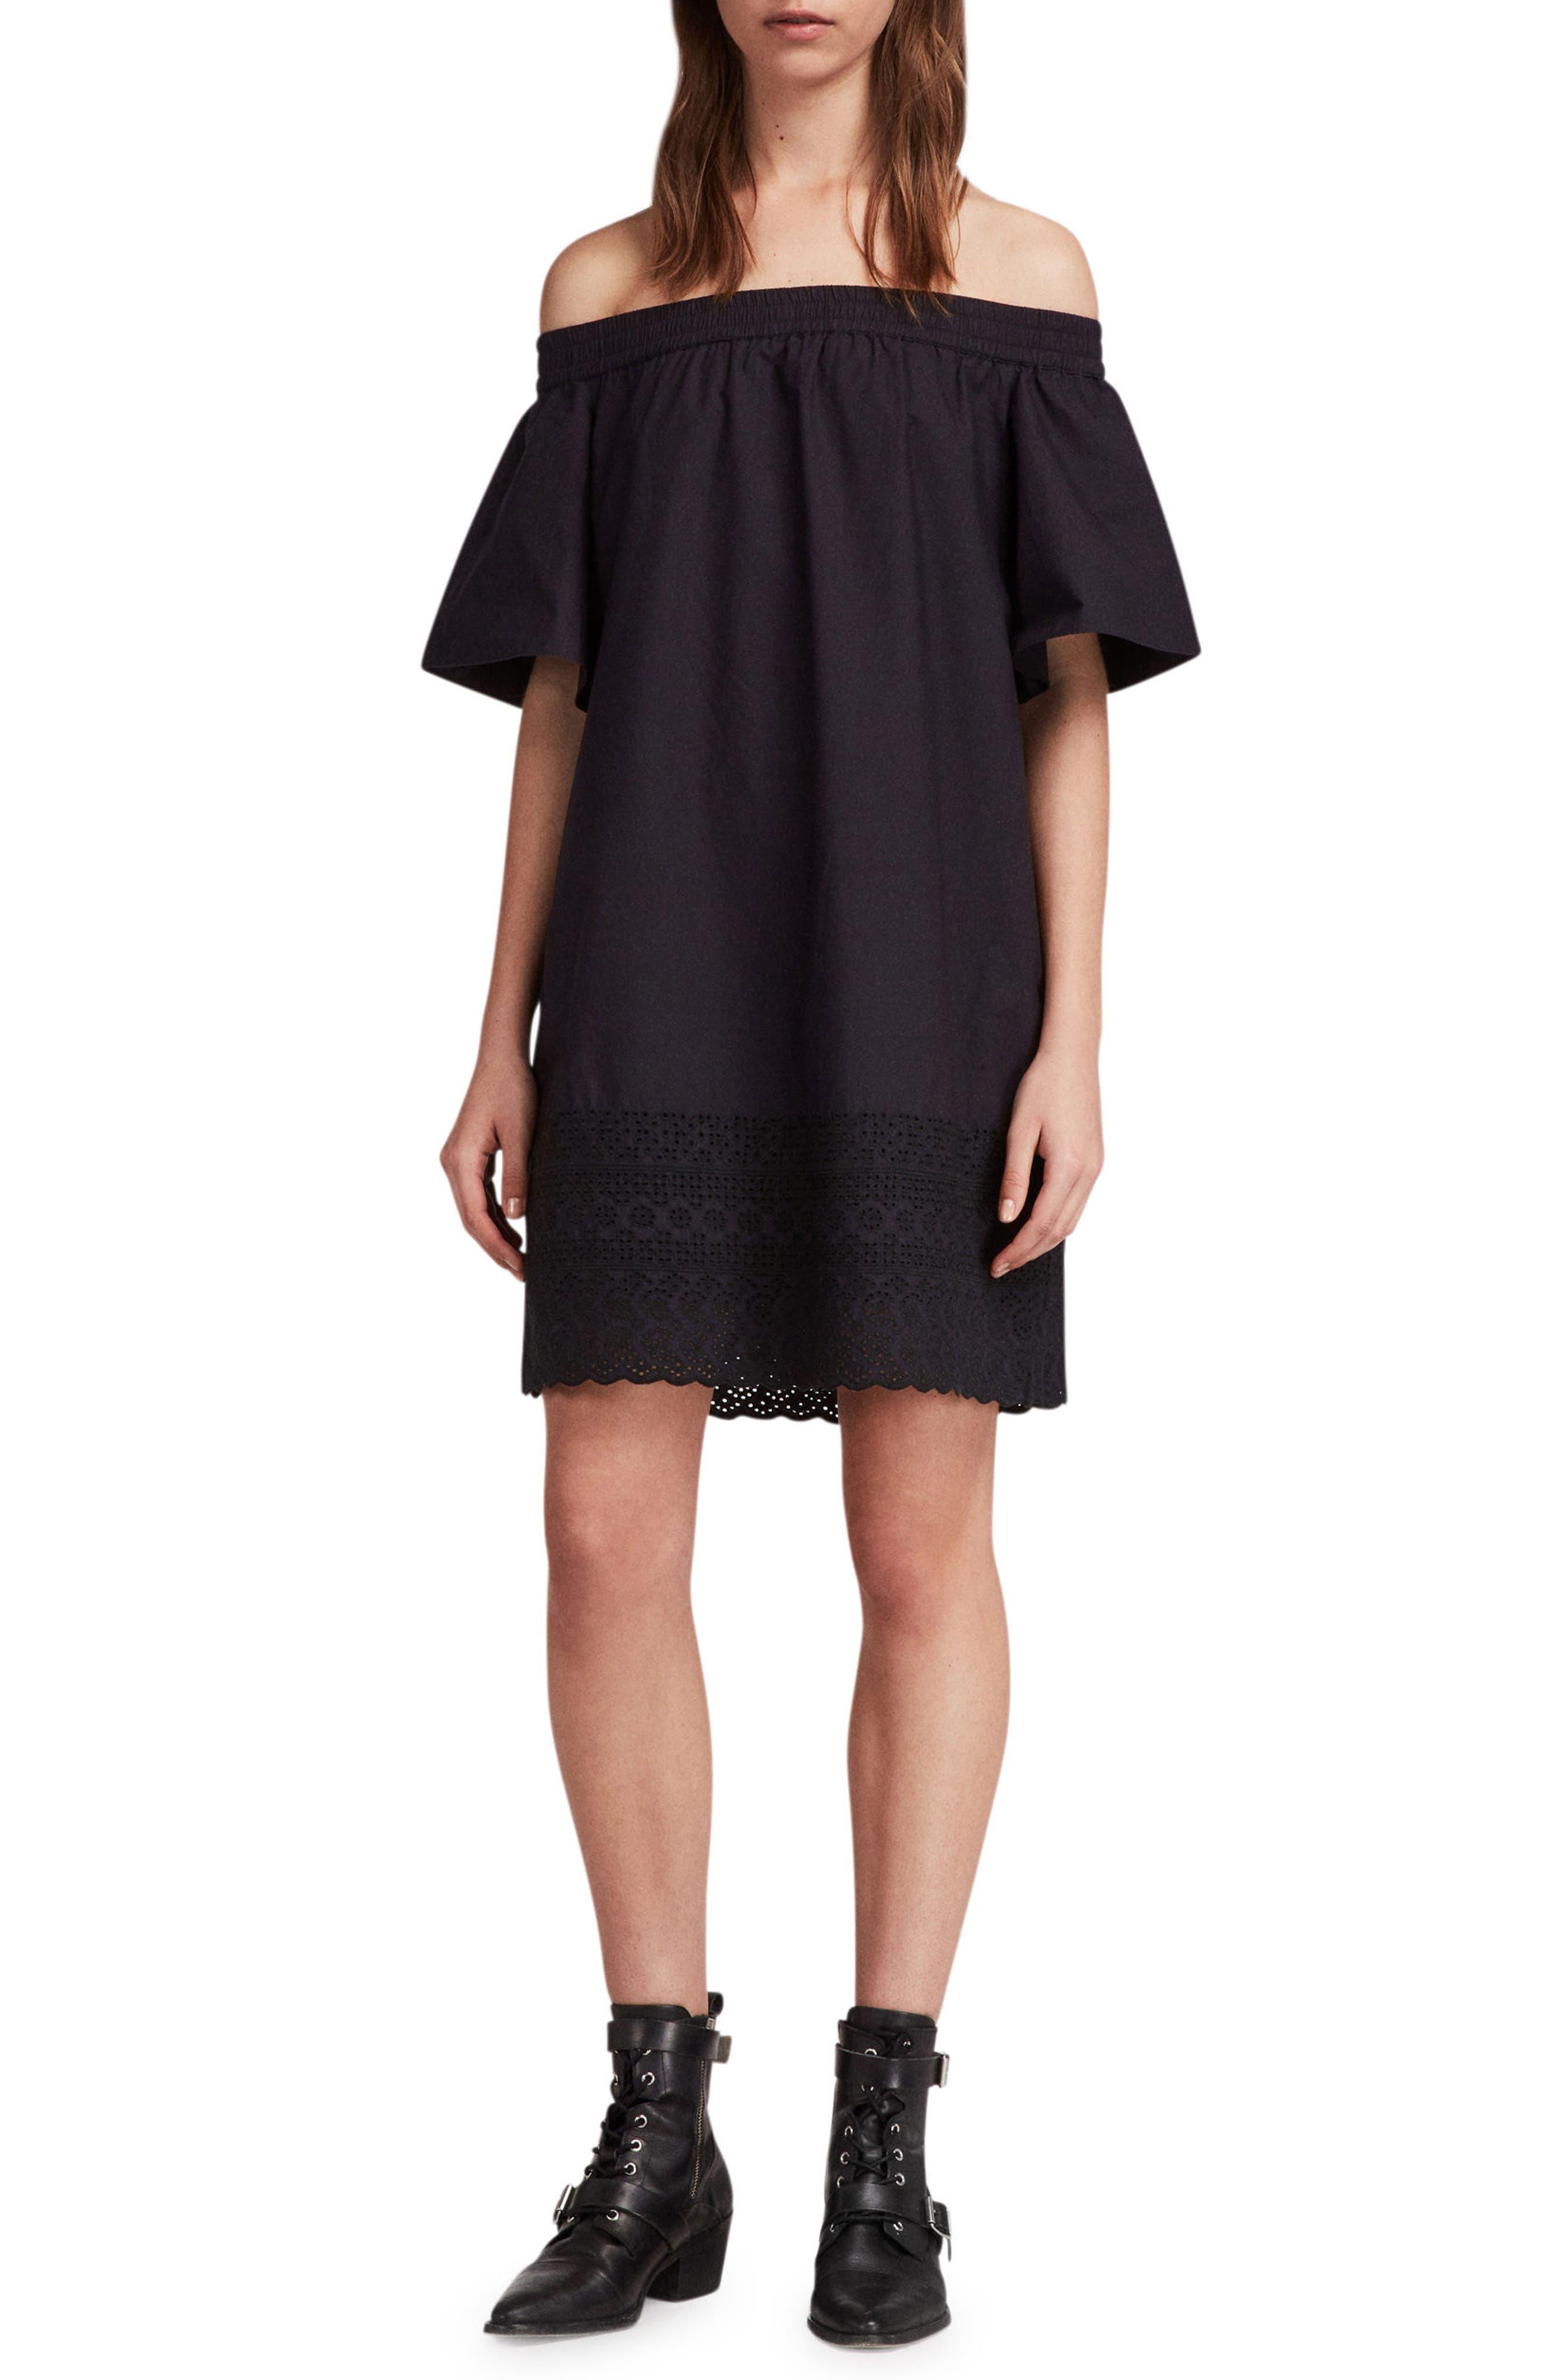 Livia Trixi Off the Shoulder Cotton Dress,                             Main thumbnail 1, color,                             BLACK